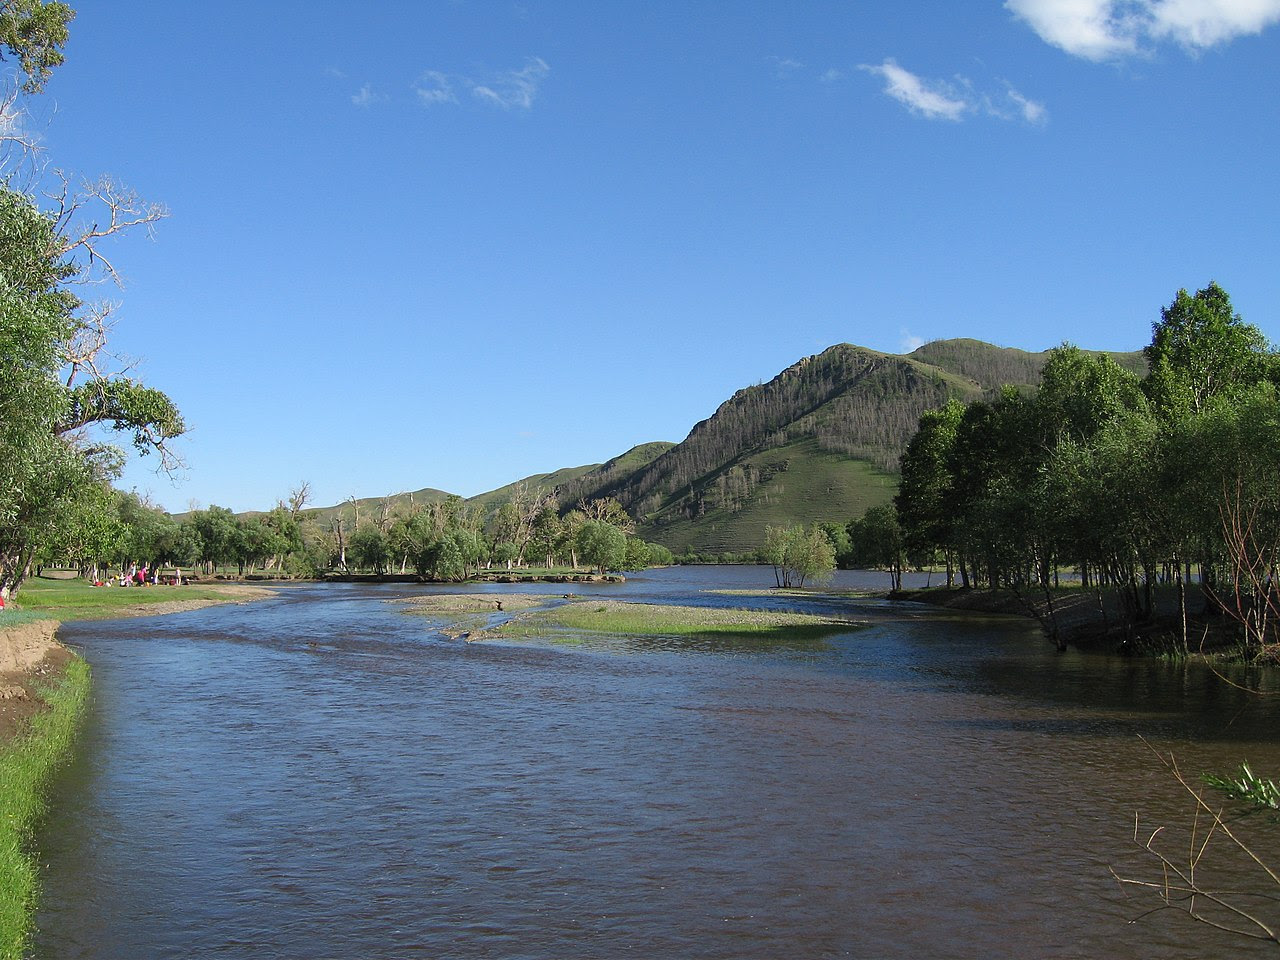 Tula Nehri